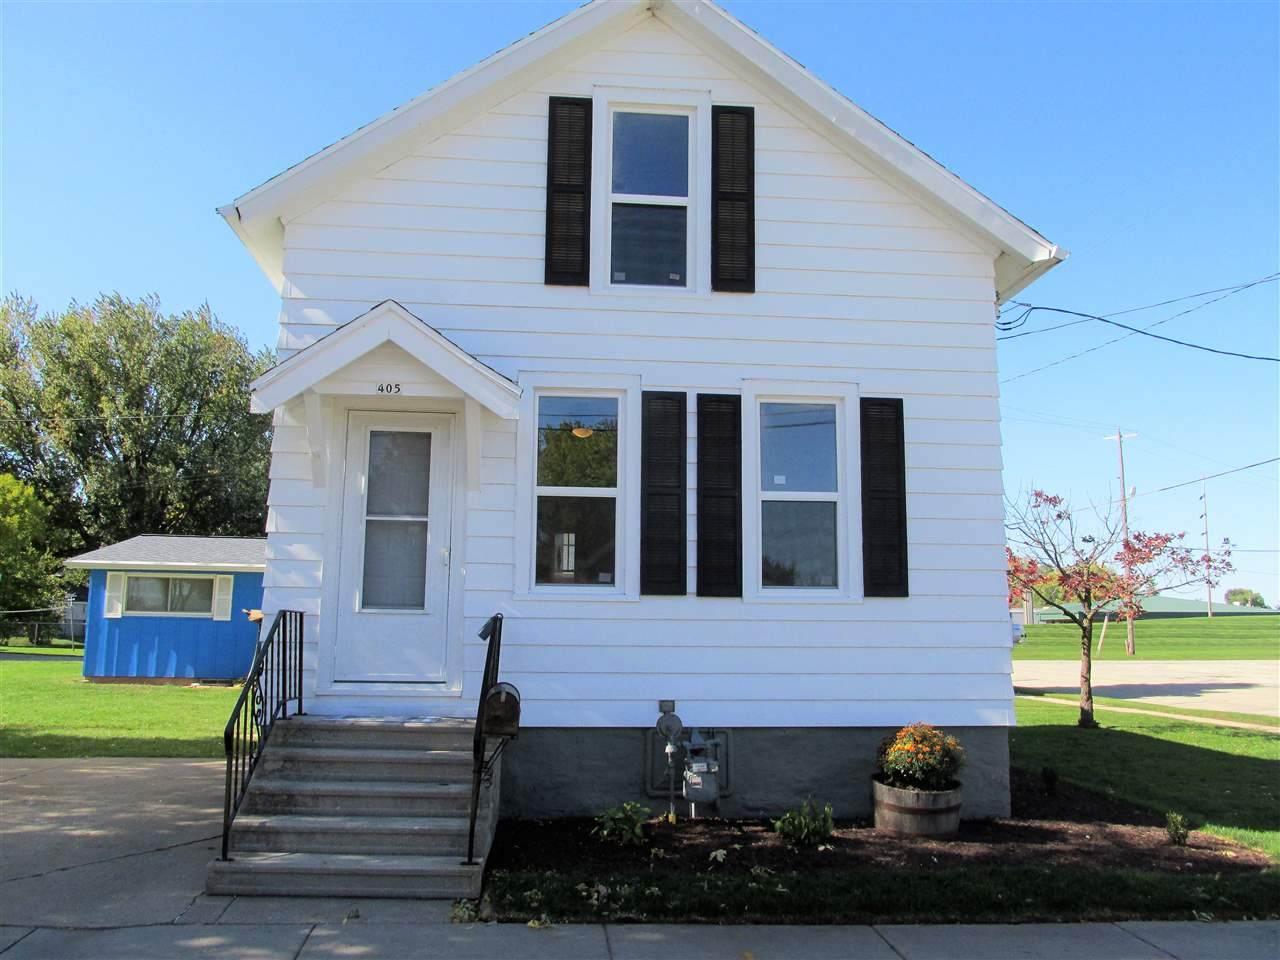 405 Michigan Street - Photo 1